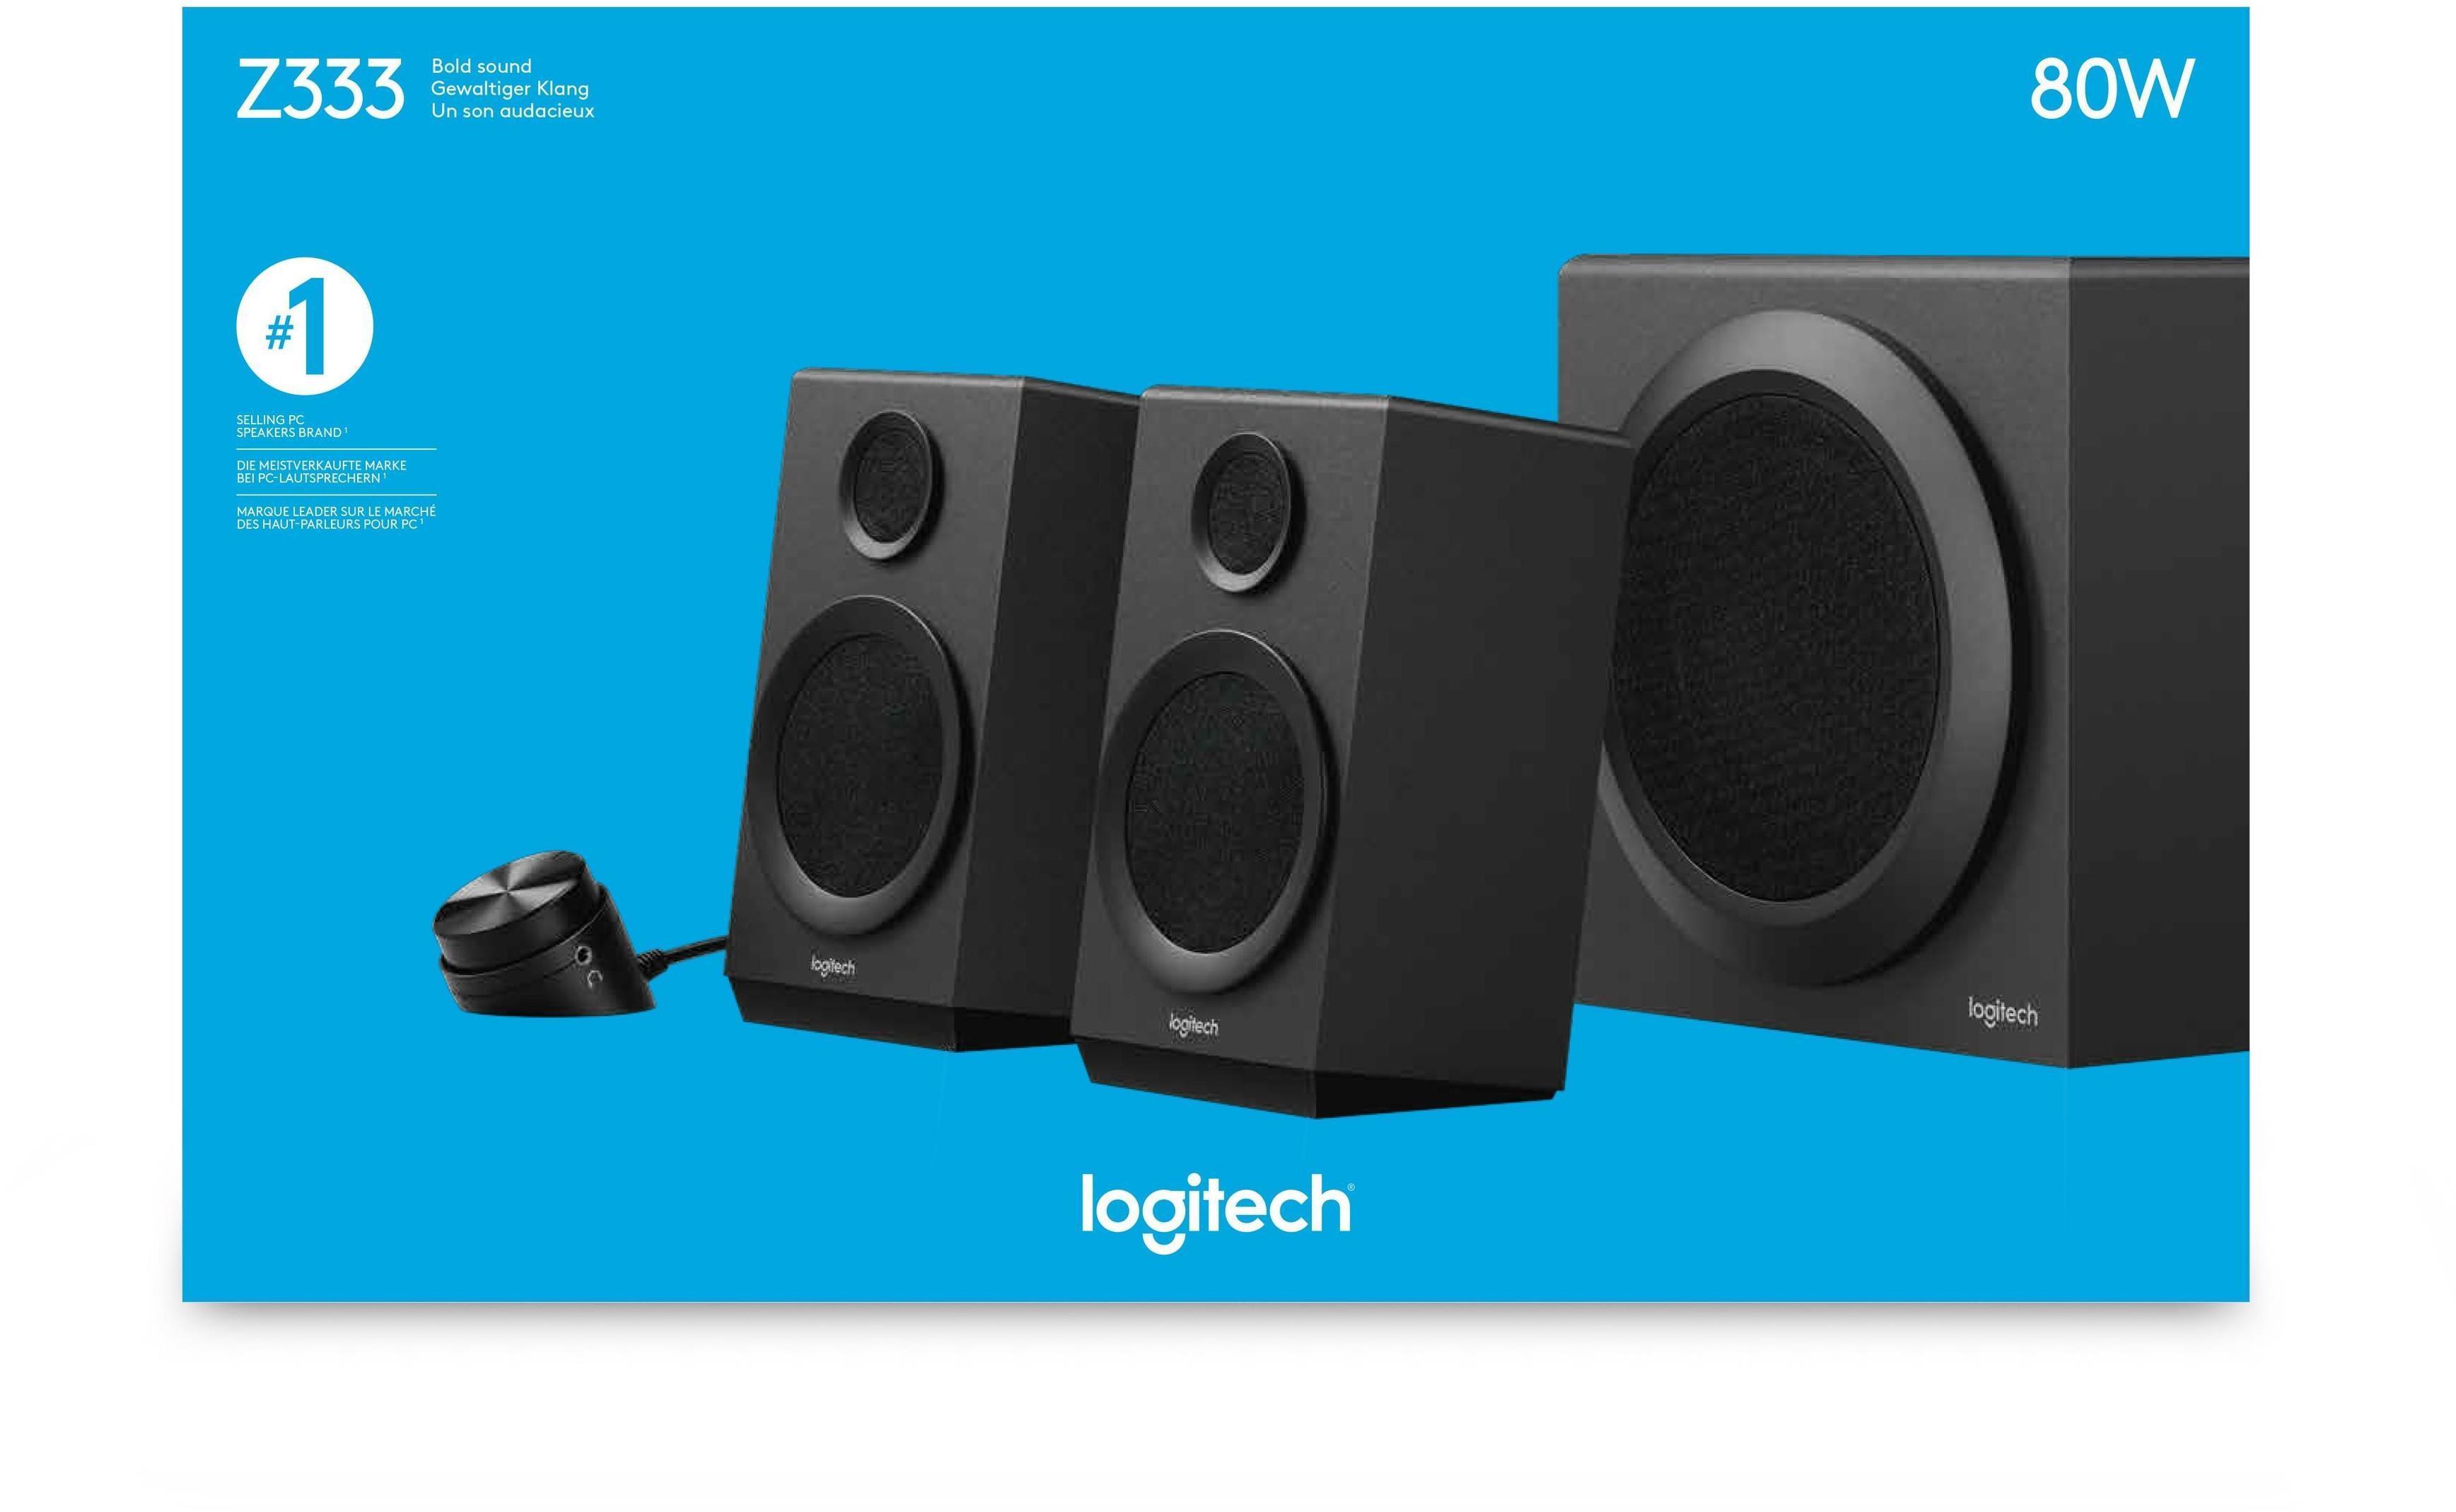 e4c962f6e6e Logitech Z333 2.1 Speaker System, 980-001201 | Box.co.uk